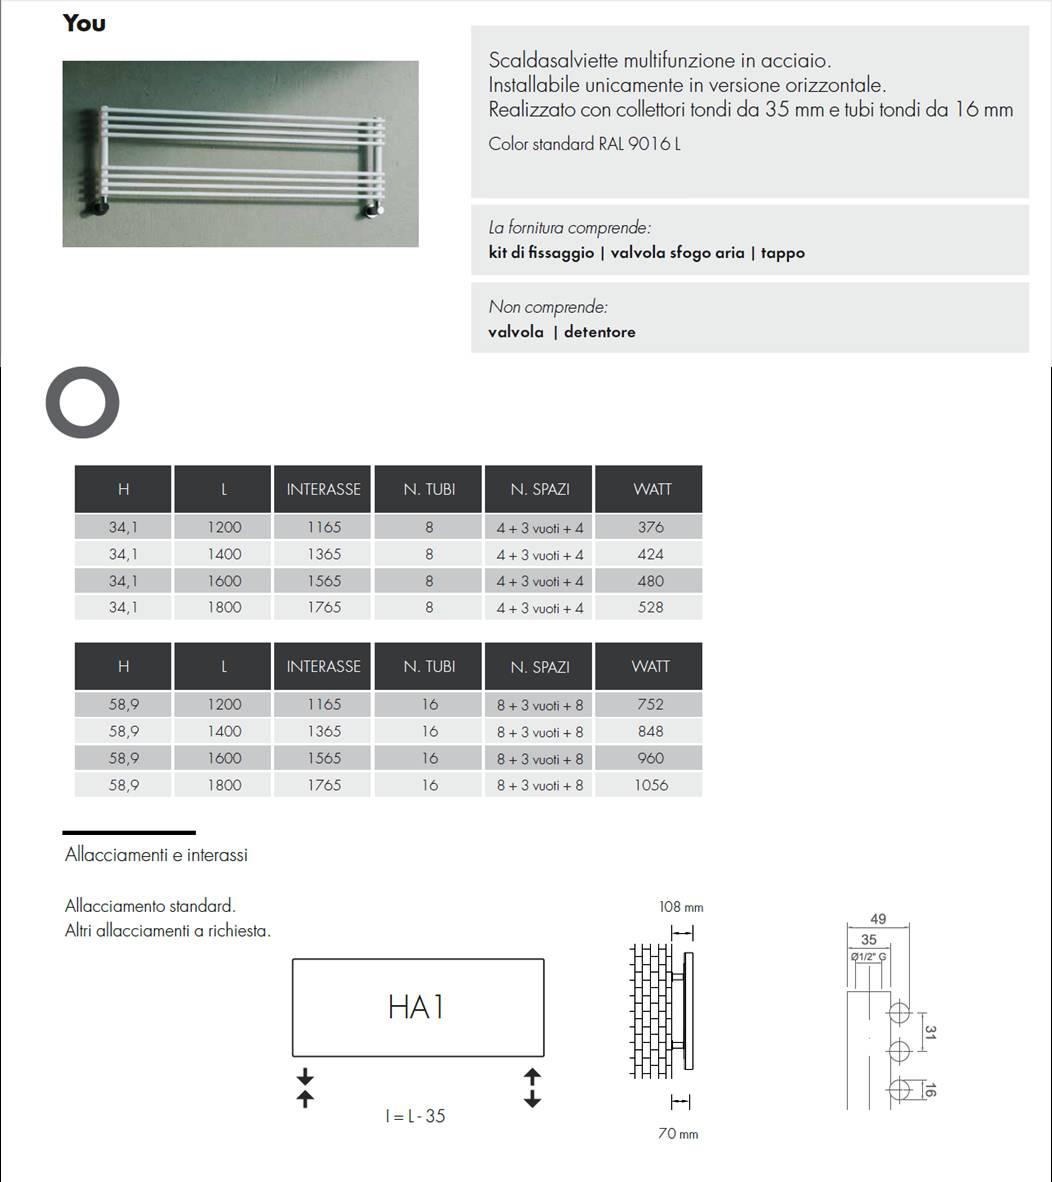 scheda_tecnica_scaldasalviette_graziano_radiators_you